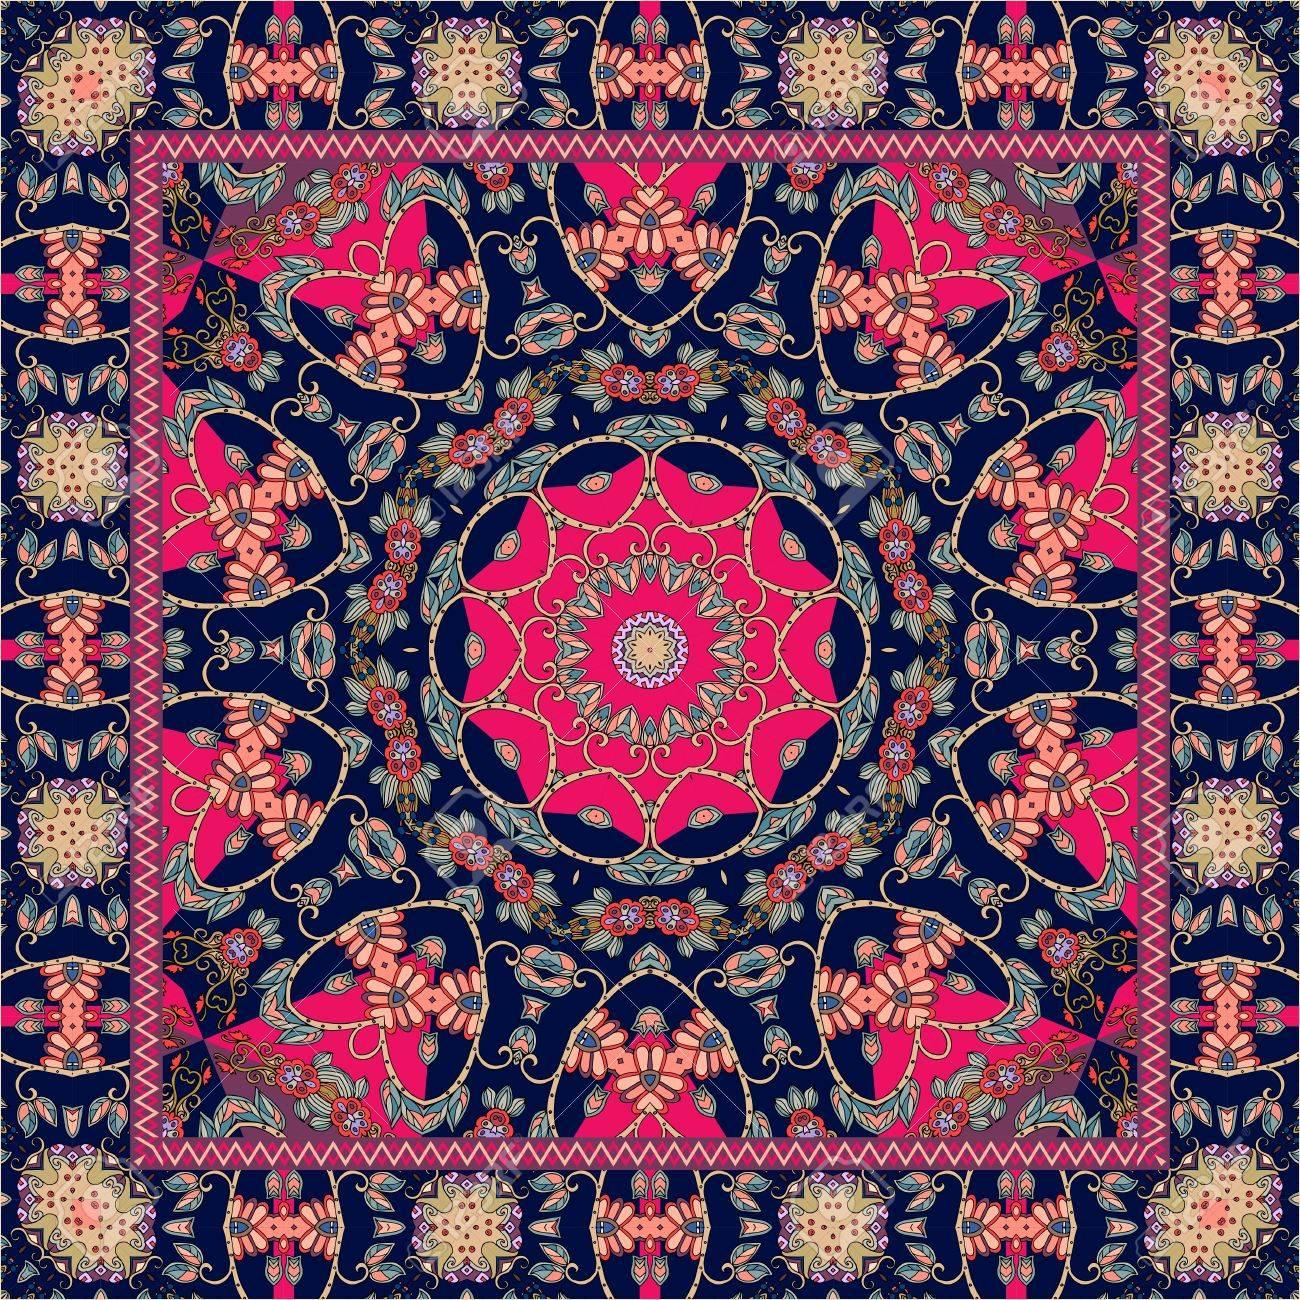 Beau Tapis Indien Avec Mandala Lumineux Et Bordure Ornementale